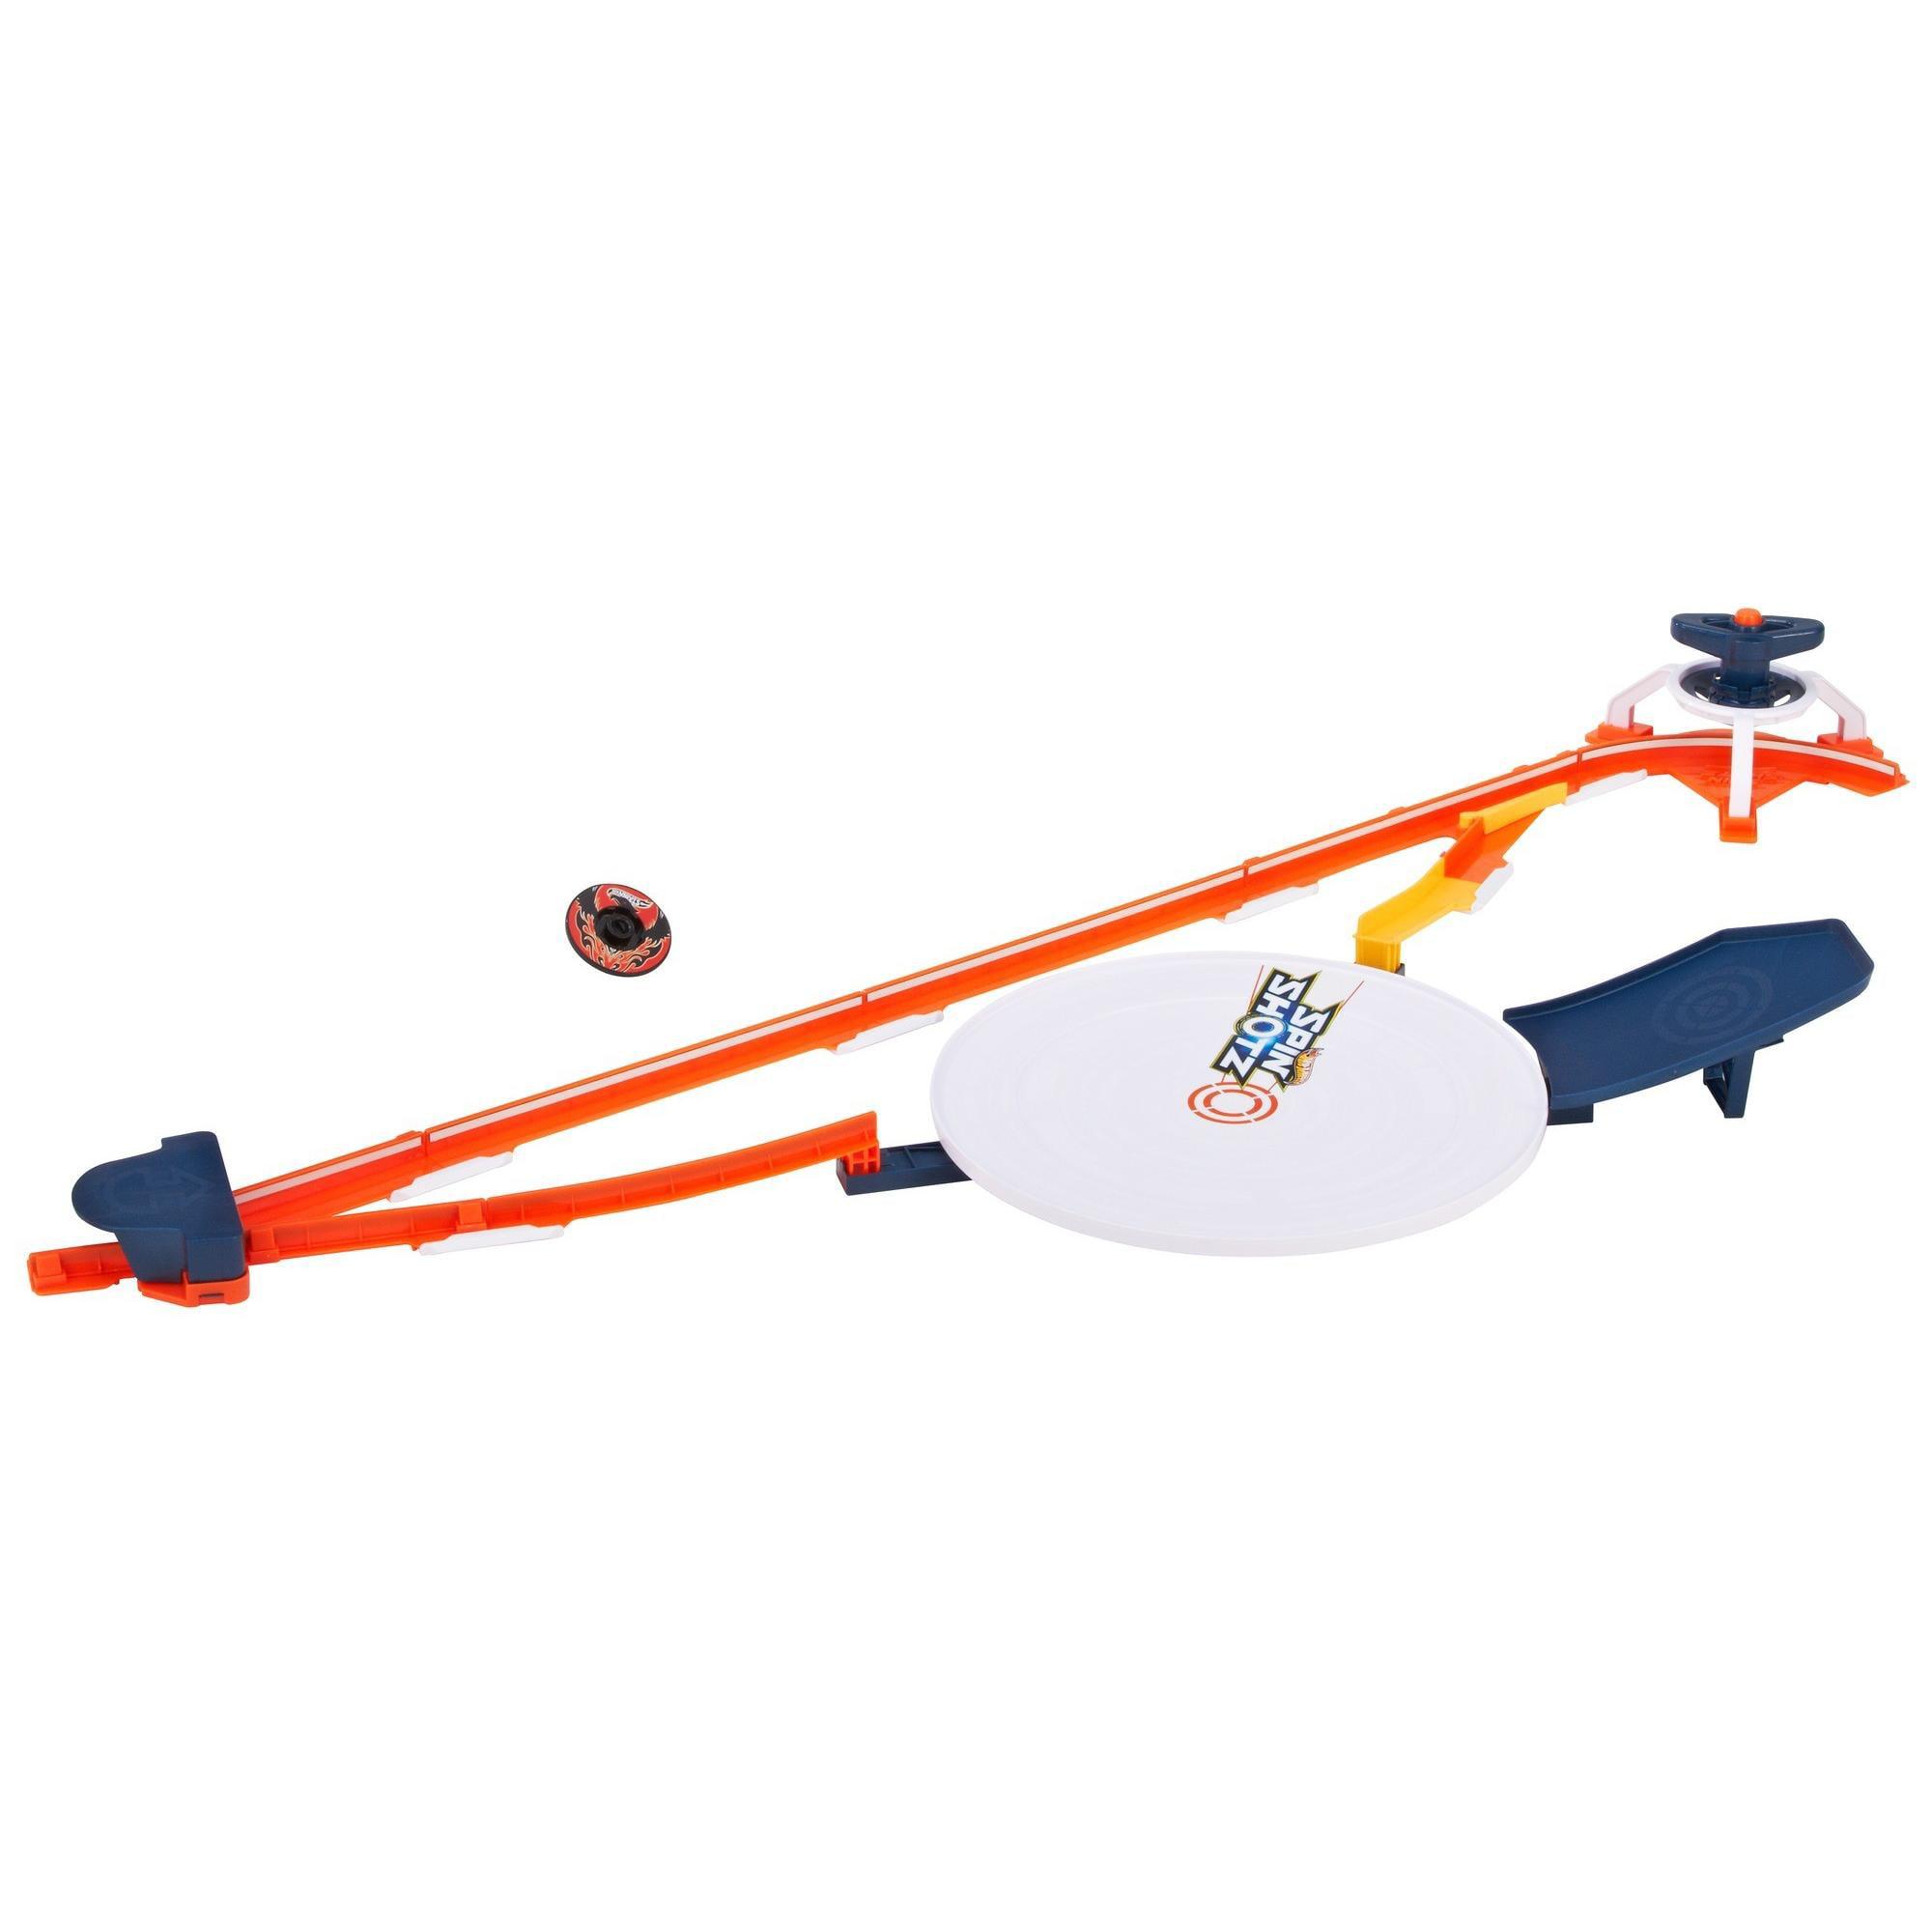 Hot Wheels Spinshotz Hyper Speed Showdown Play Set